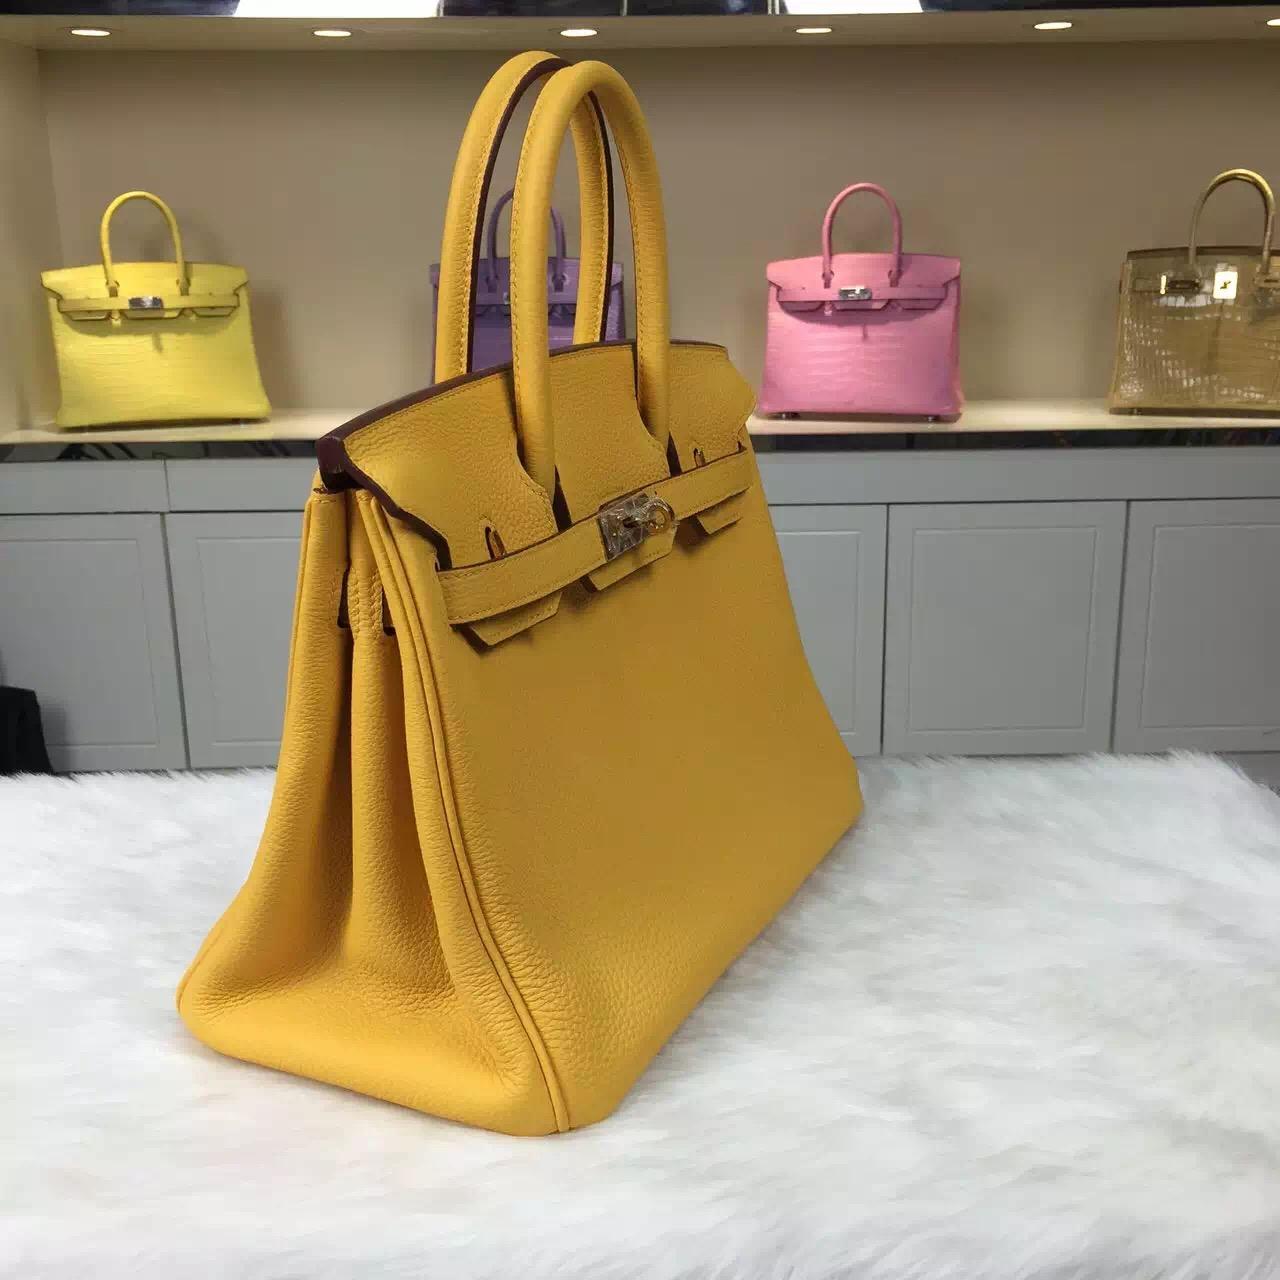 Hermes 9U Mustard Yellow Togo Calfskin Leather Birkin Bag 30CM Women's Tote Bag